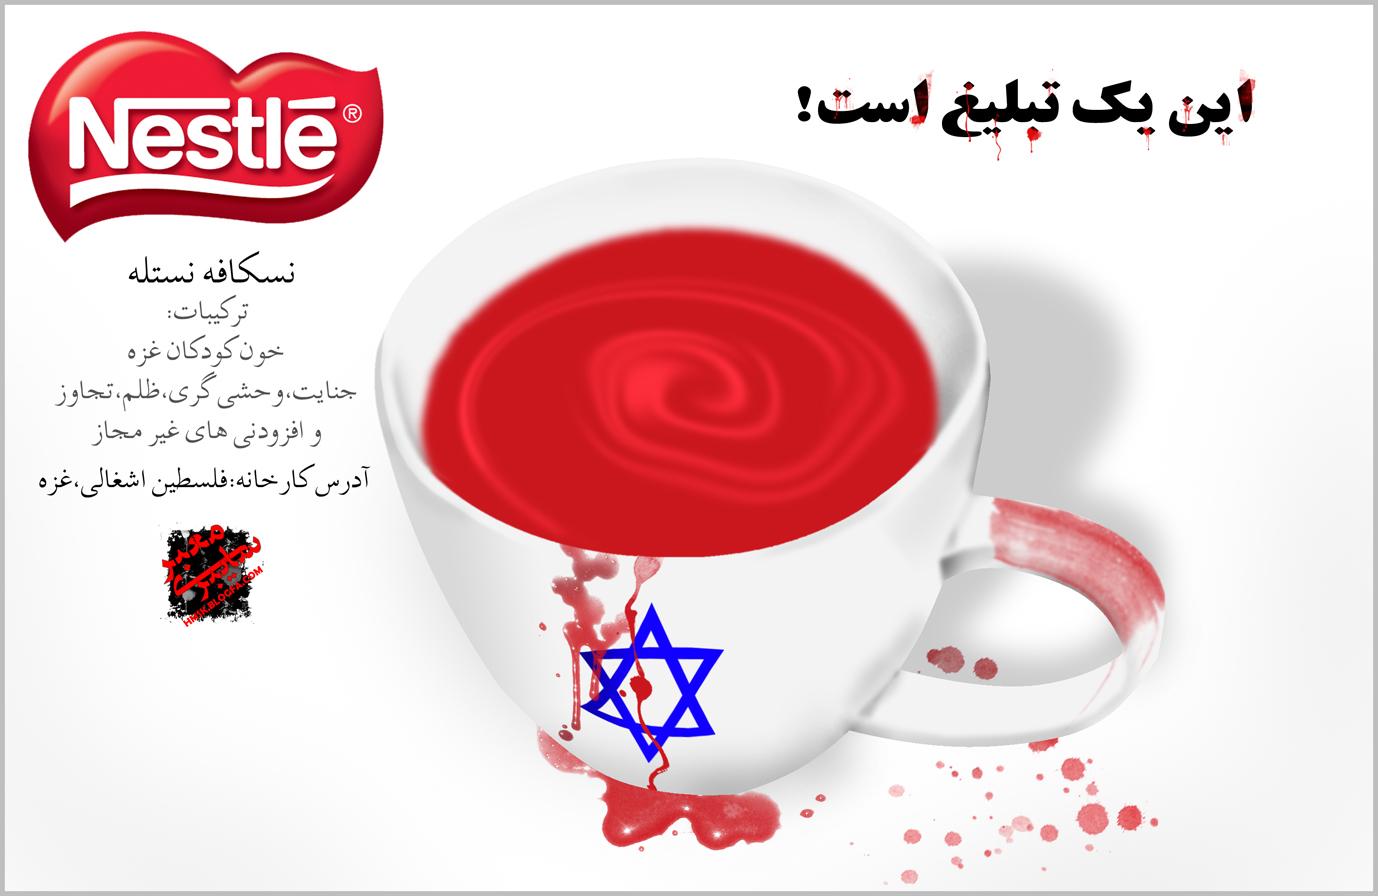 http://sobhegharib3.persiangig.com/image/namayeshgah/c3.jpg